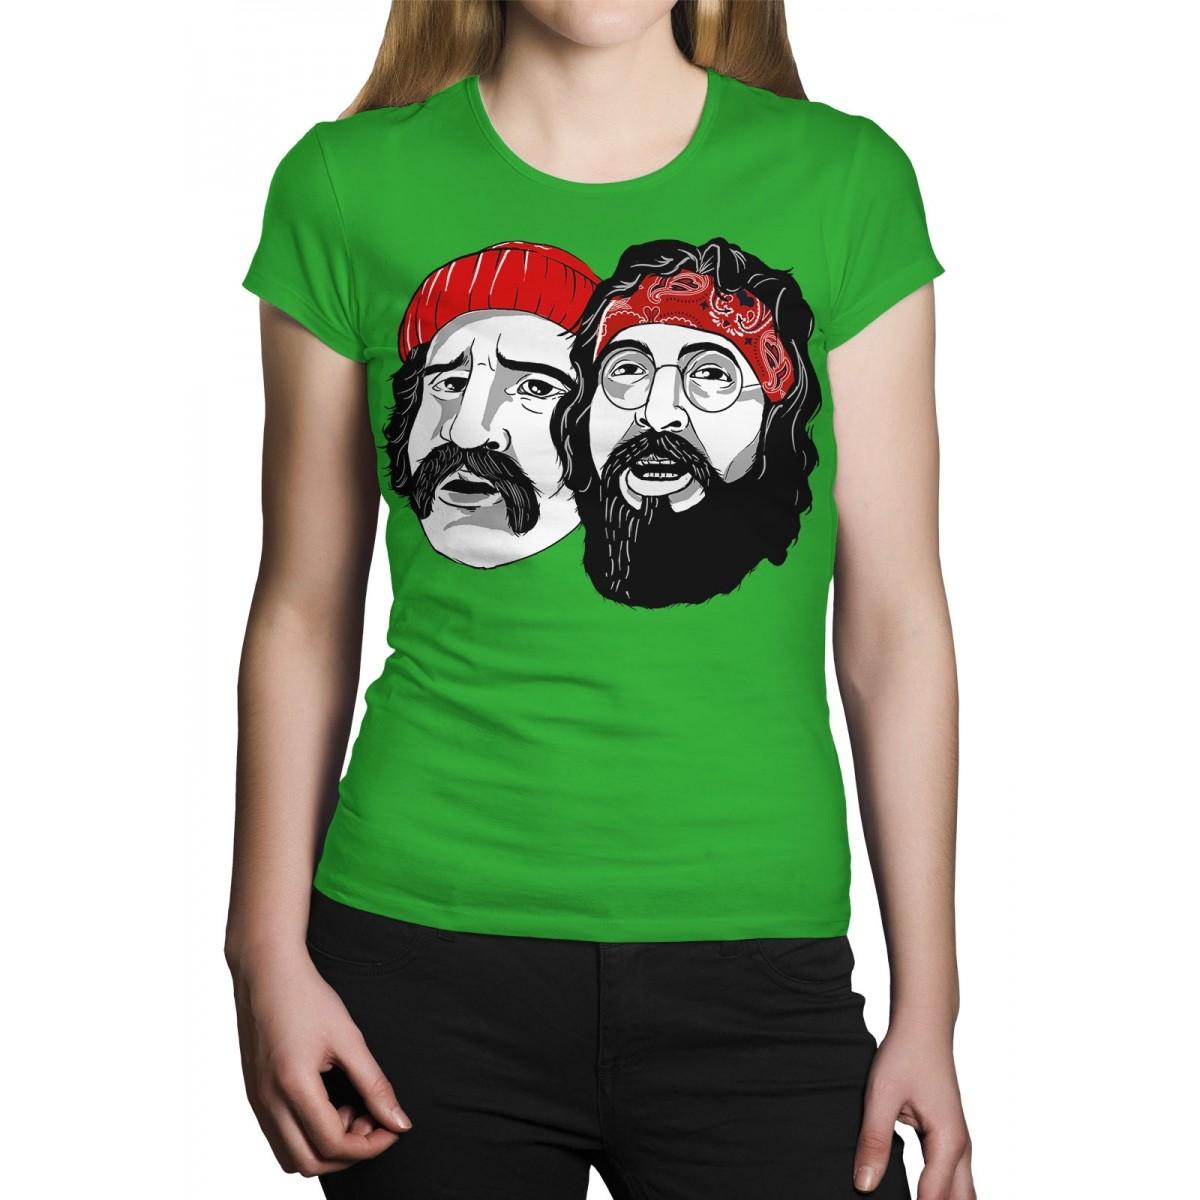 Camiseta HShop Cheech & Chong Verde  - HShop